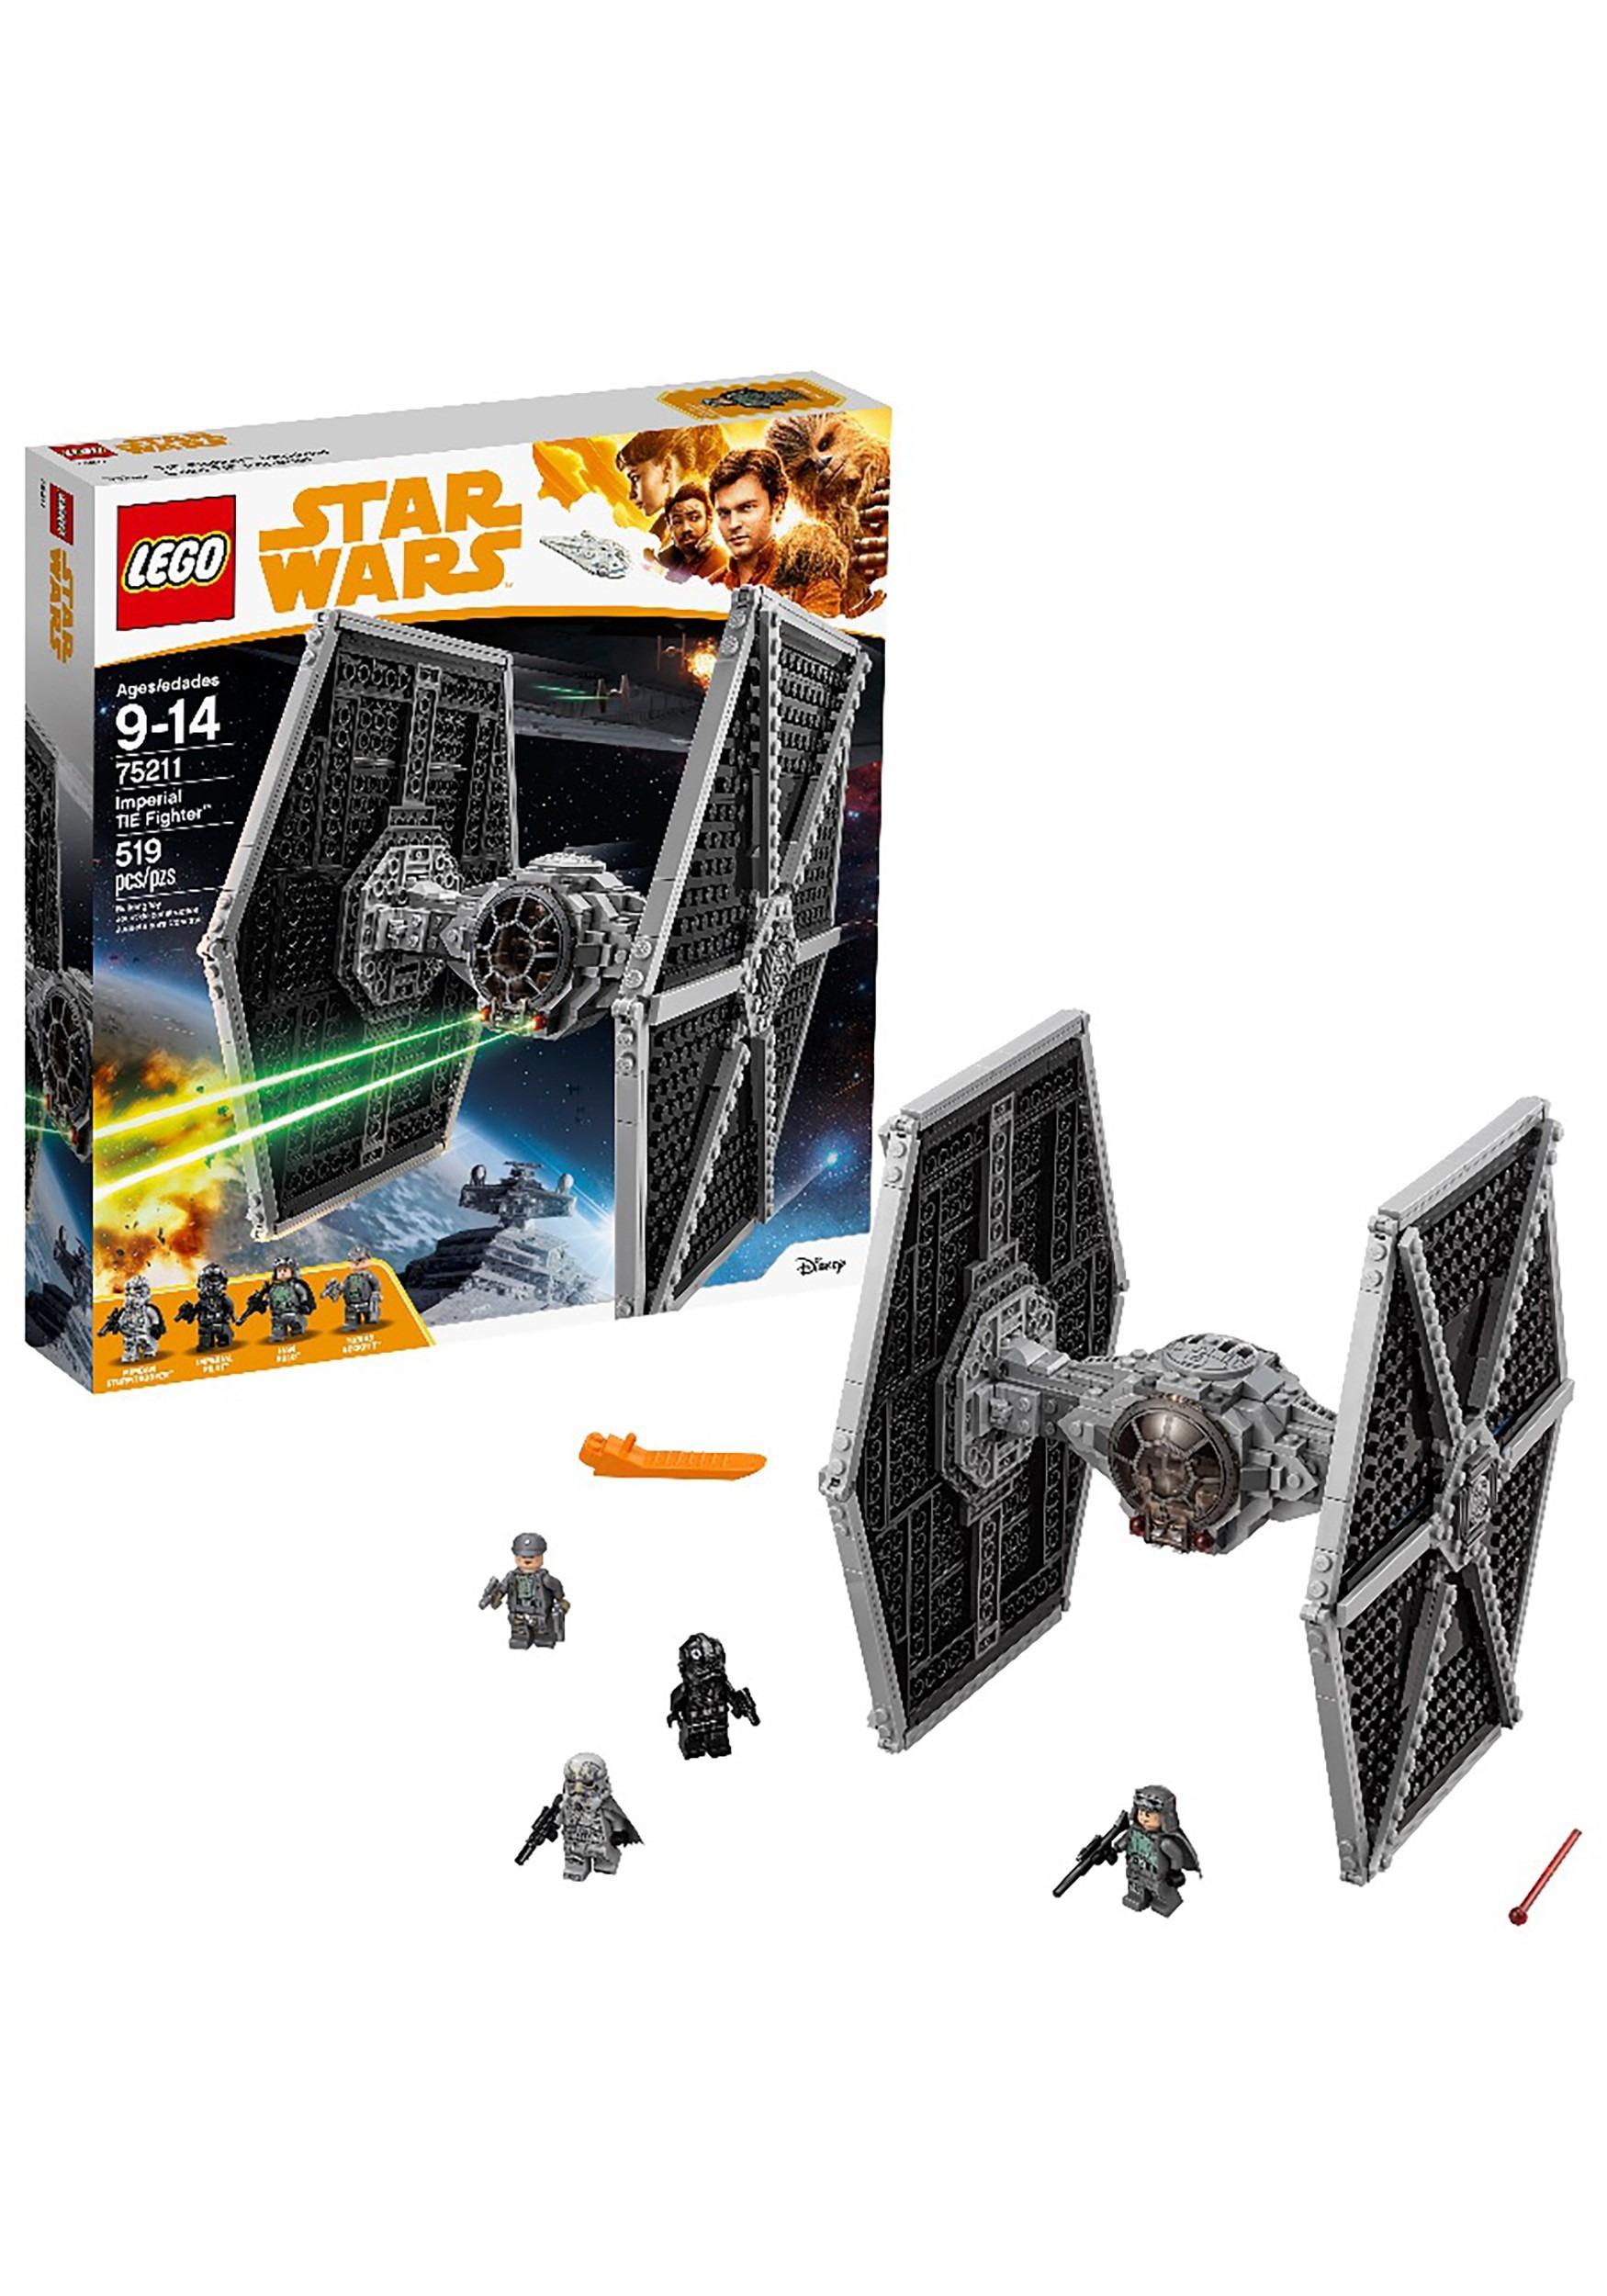 Lego Star Wars Imperial Tie Fighter Set